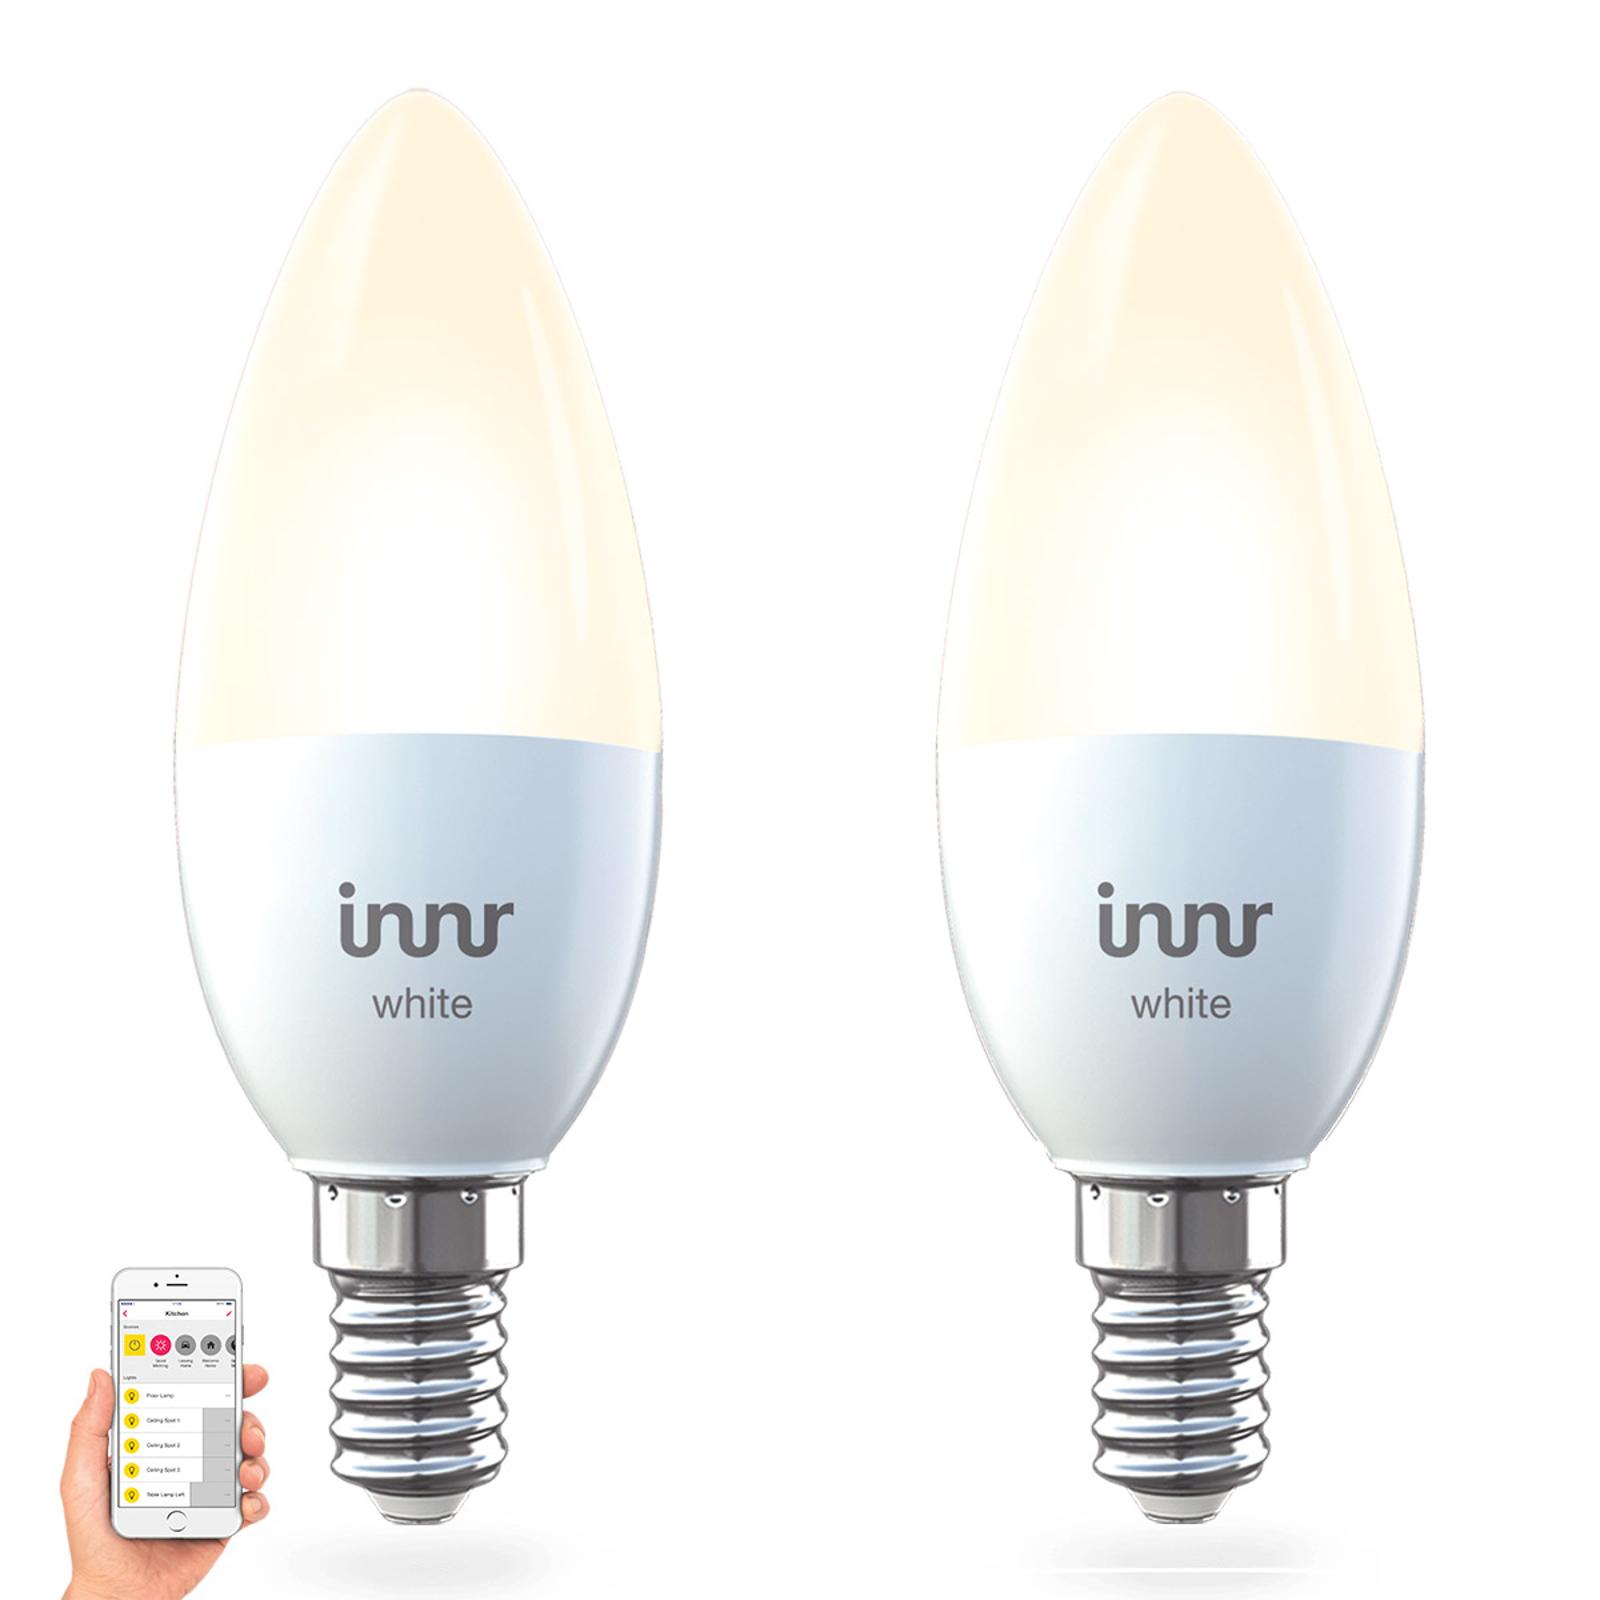 E14 5,3 W LED-Lampe Innr Smart Candle White, 2er